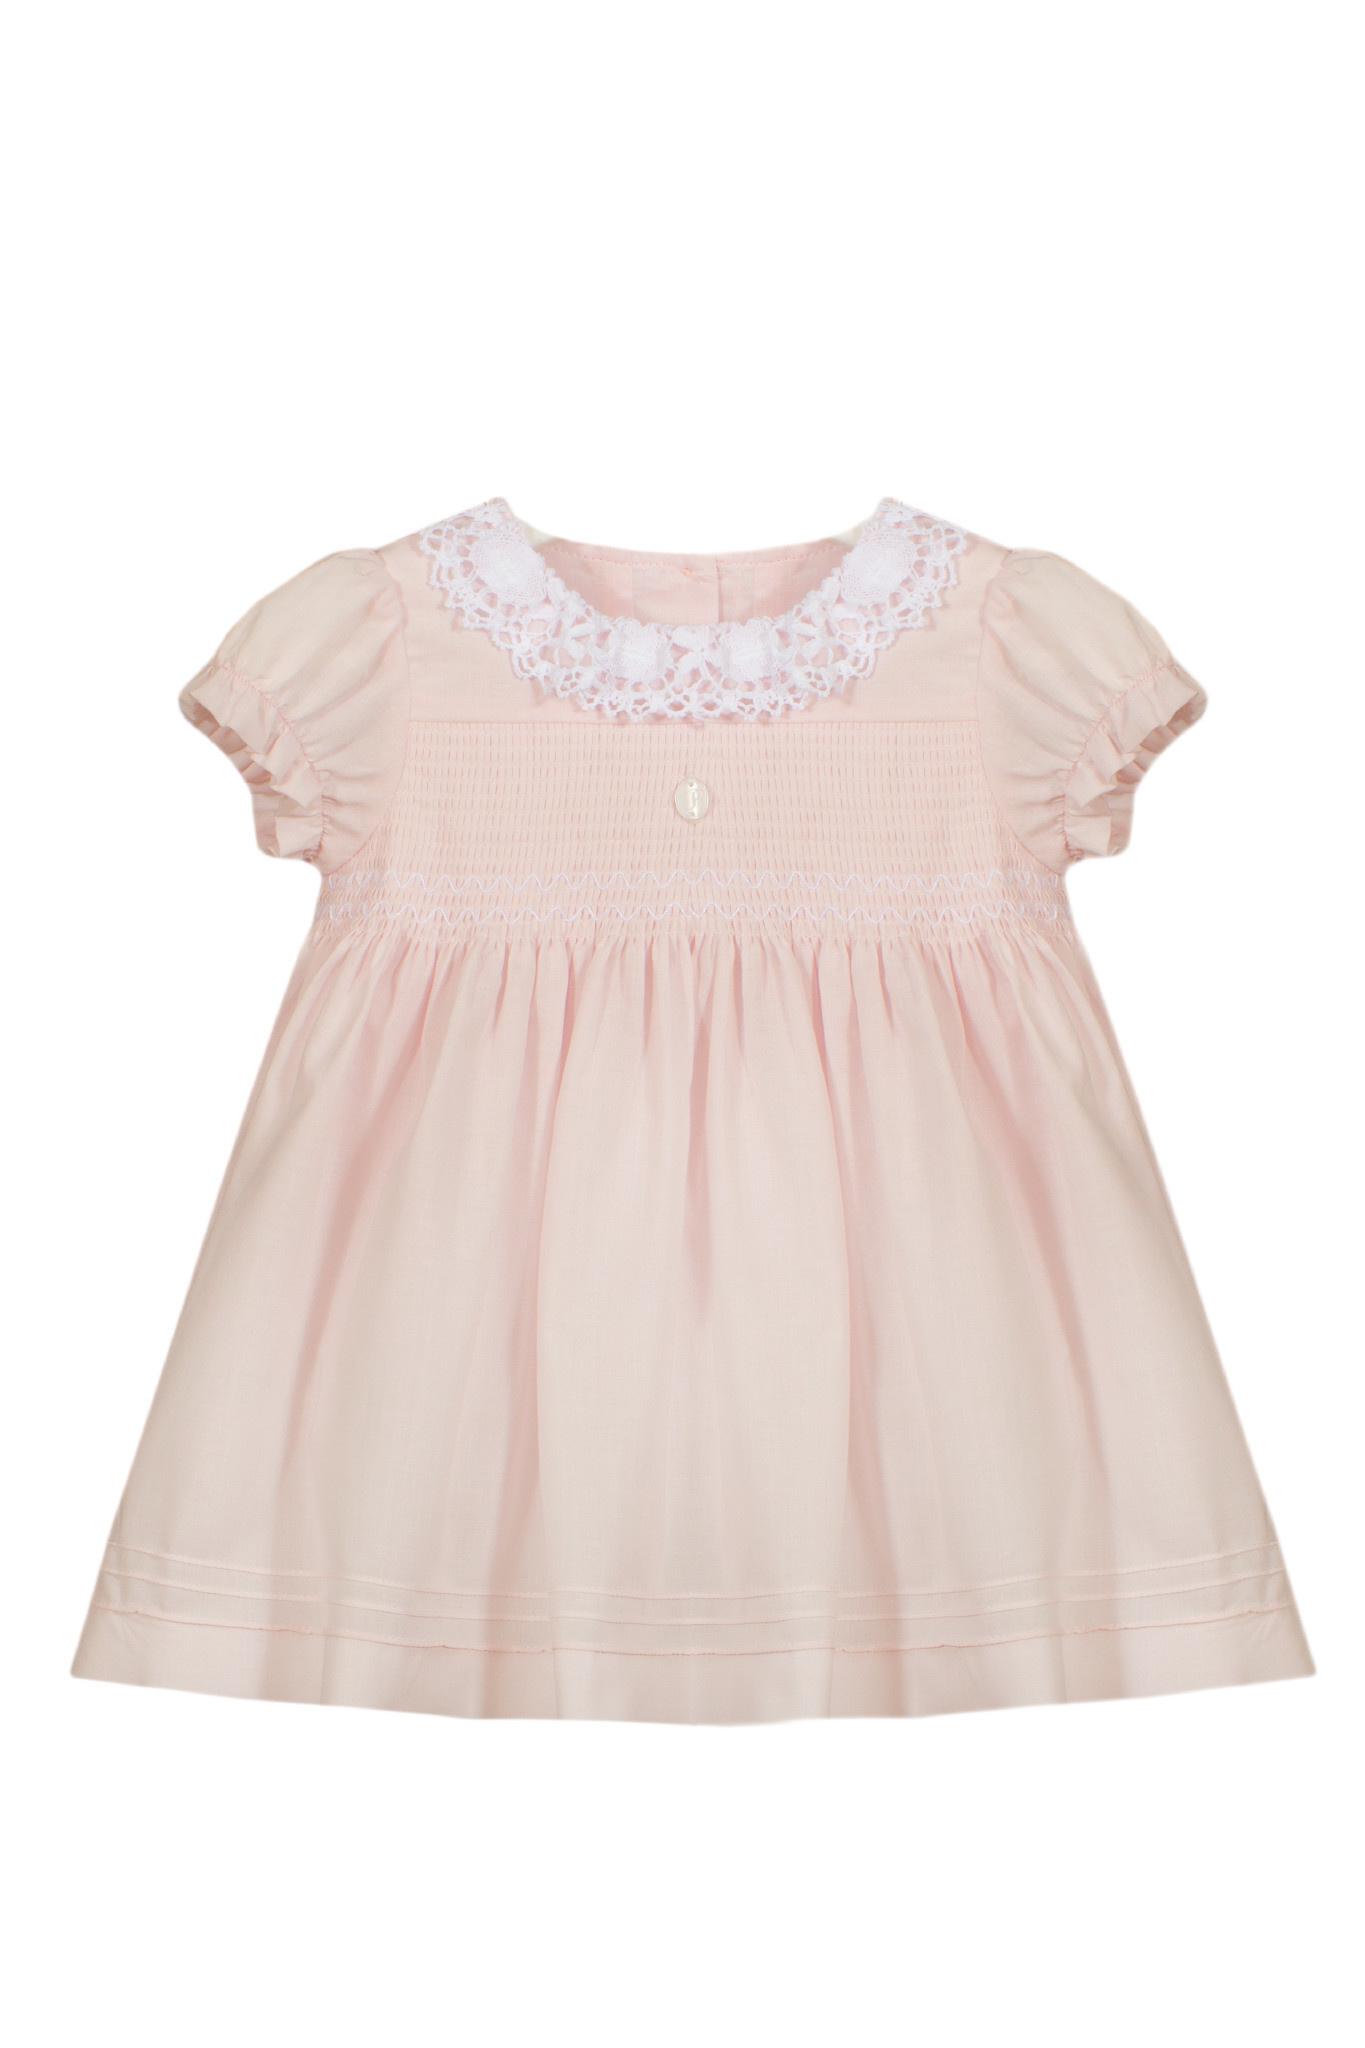 Patachou Patachou Baby 043 Smocked Pink Dress